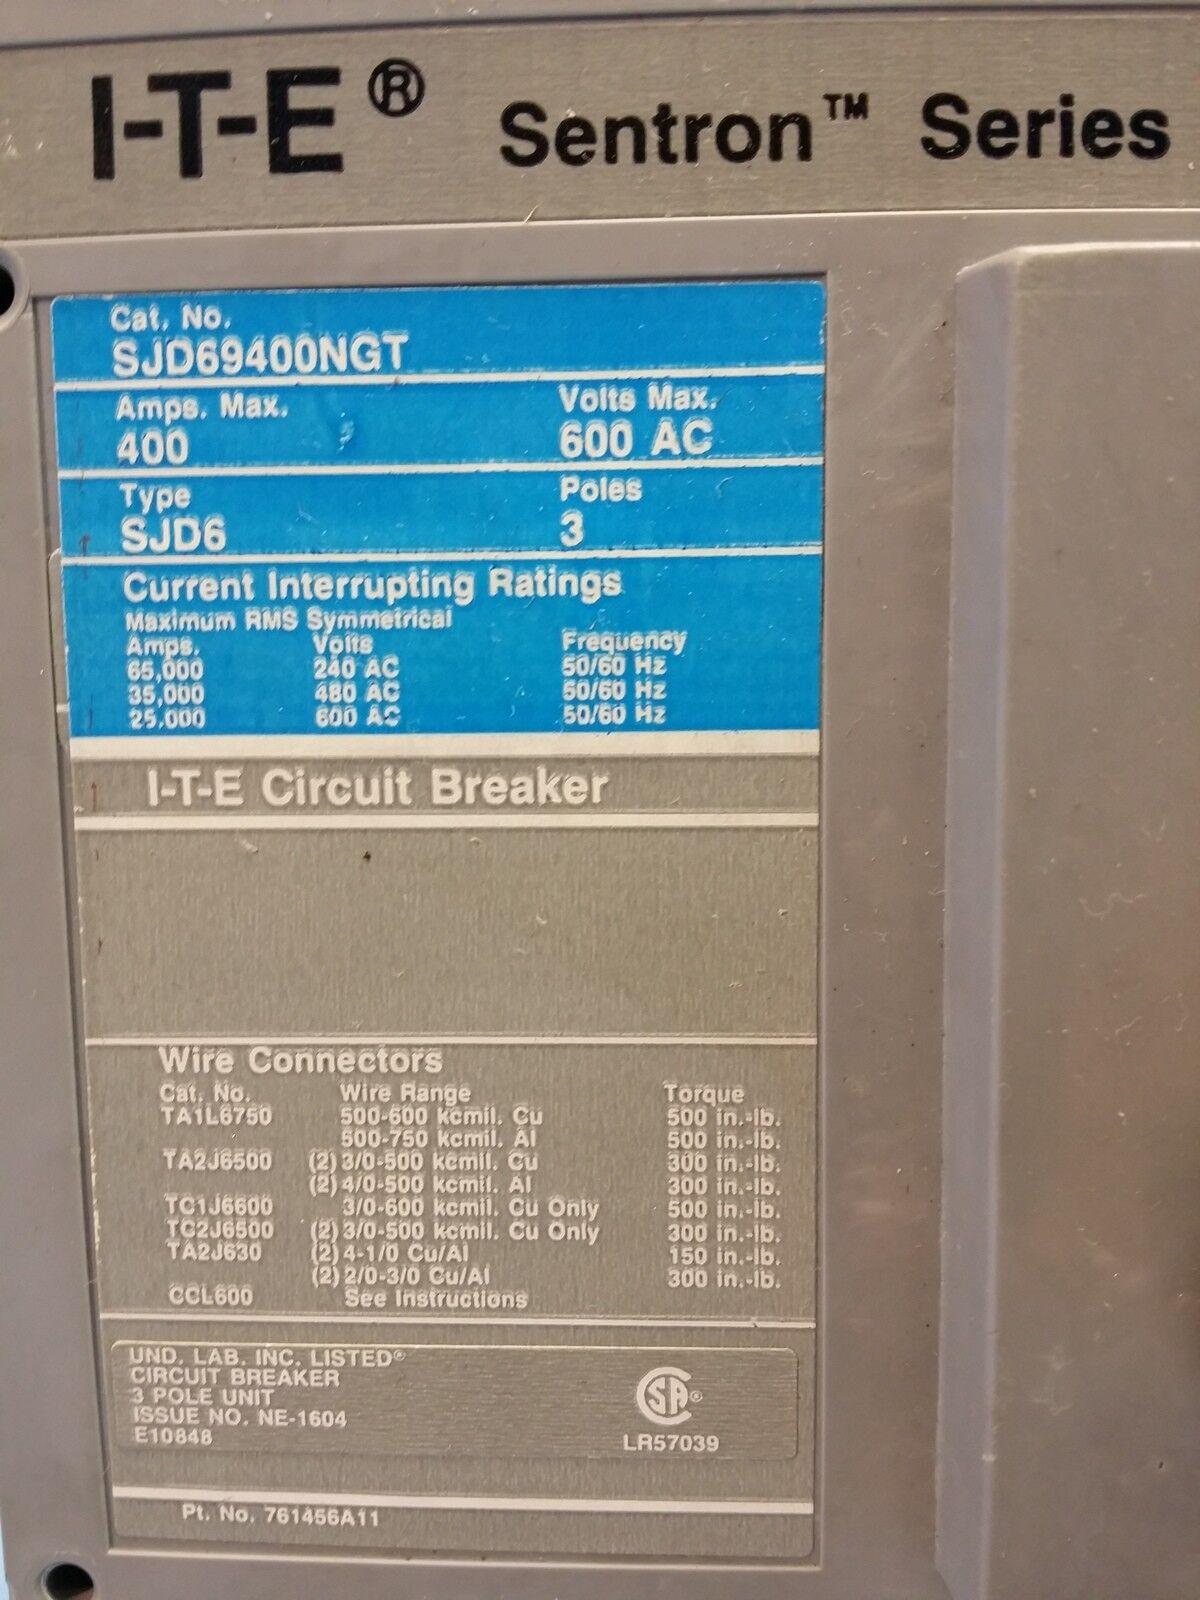 ITE Siemens SJD69400NGT 400 Amp Sentron Series Breaker 400a Trip ...